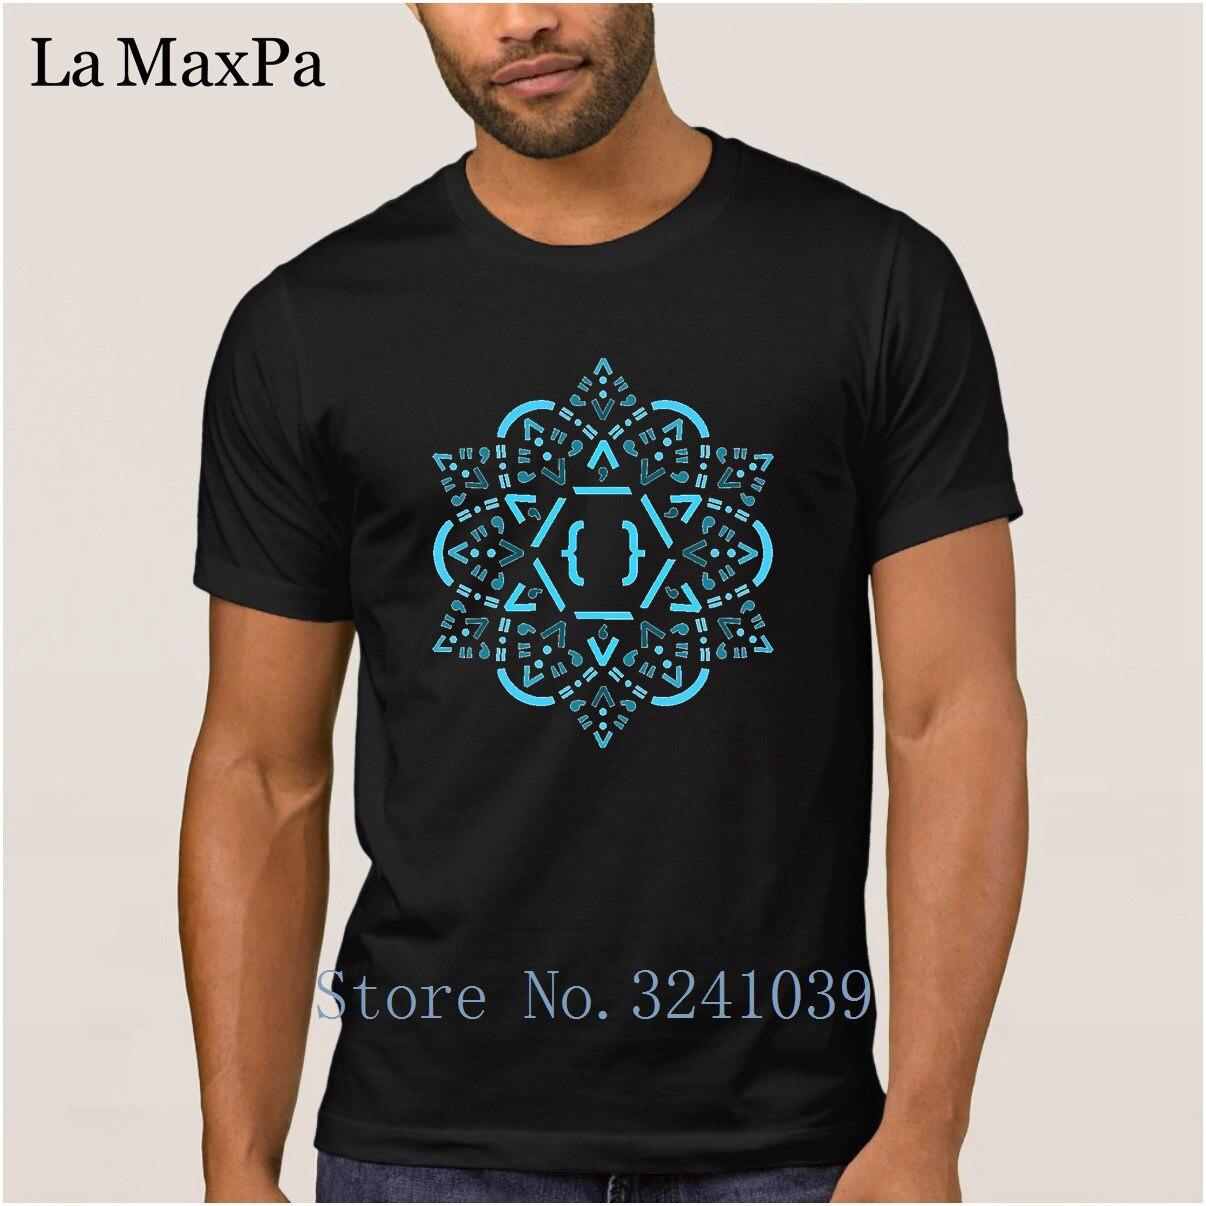 Breathable T-Shirt For Men 100% Cotton Short Sleeve Sunlight Men T Shirt Code Mandala React Framework Tshirt Man Clothing